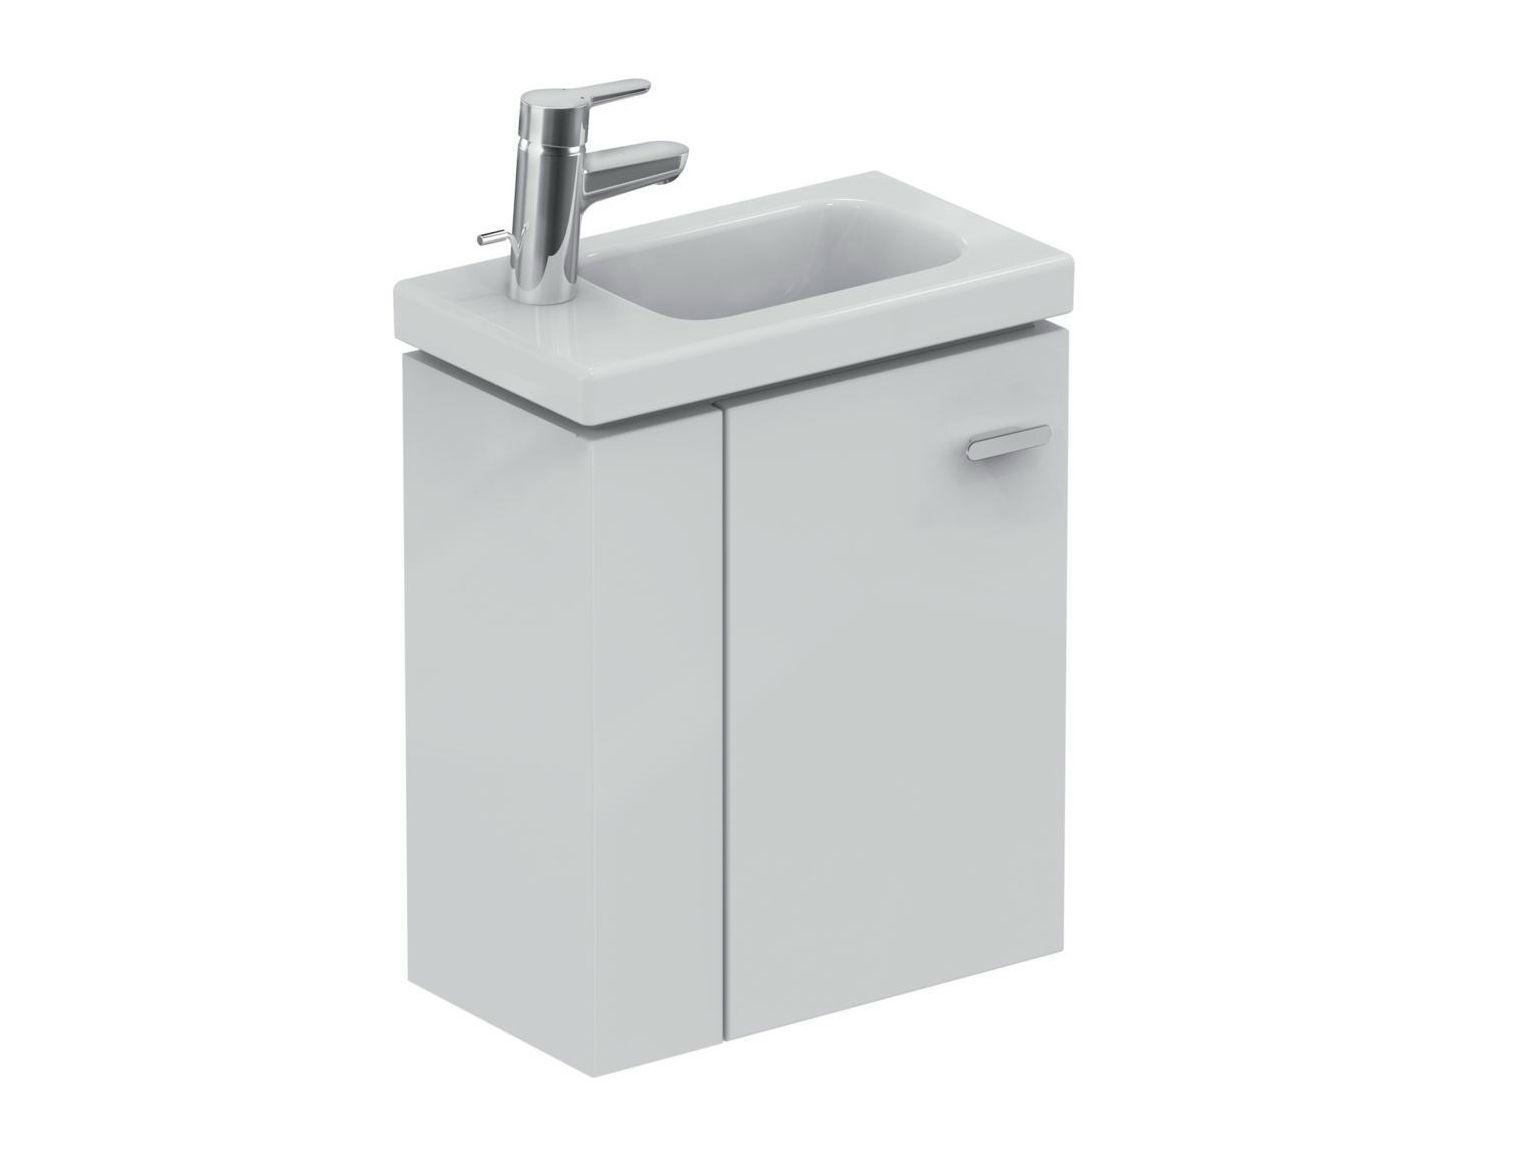 Lavabo bagno ideal standard ~ avienix.com for .